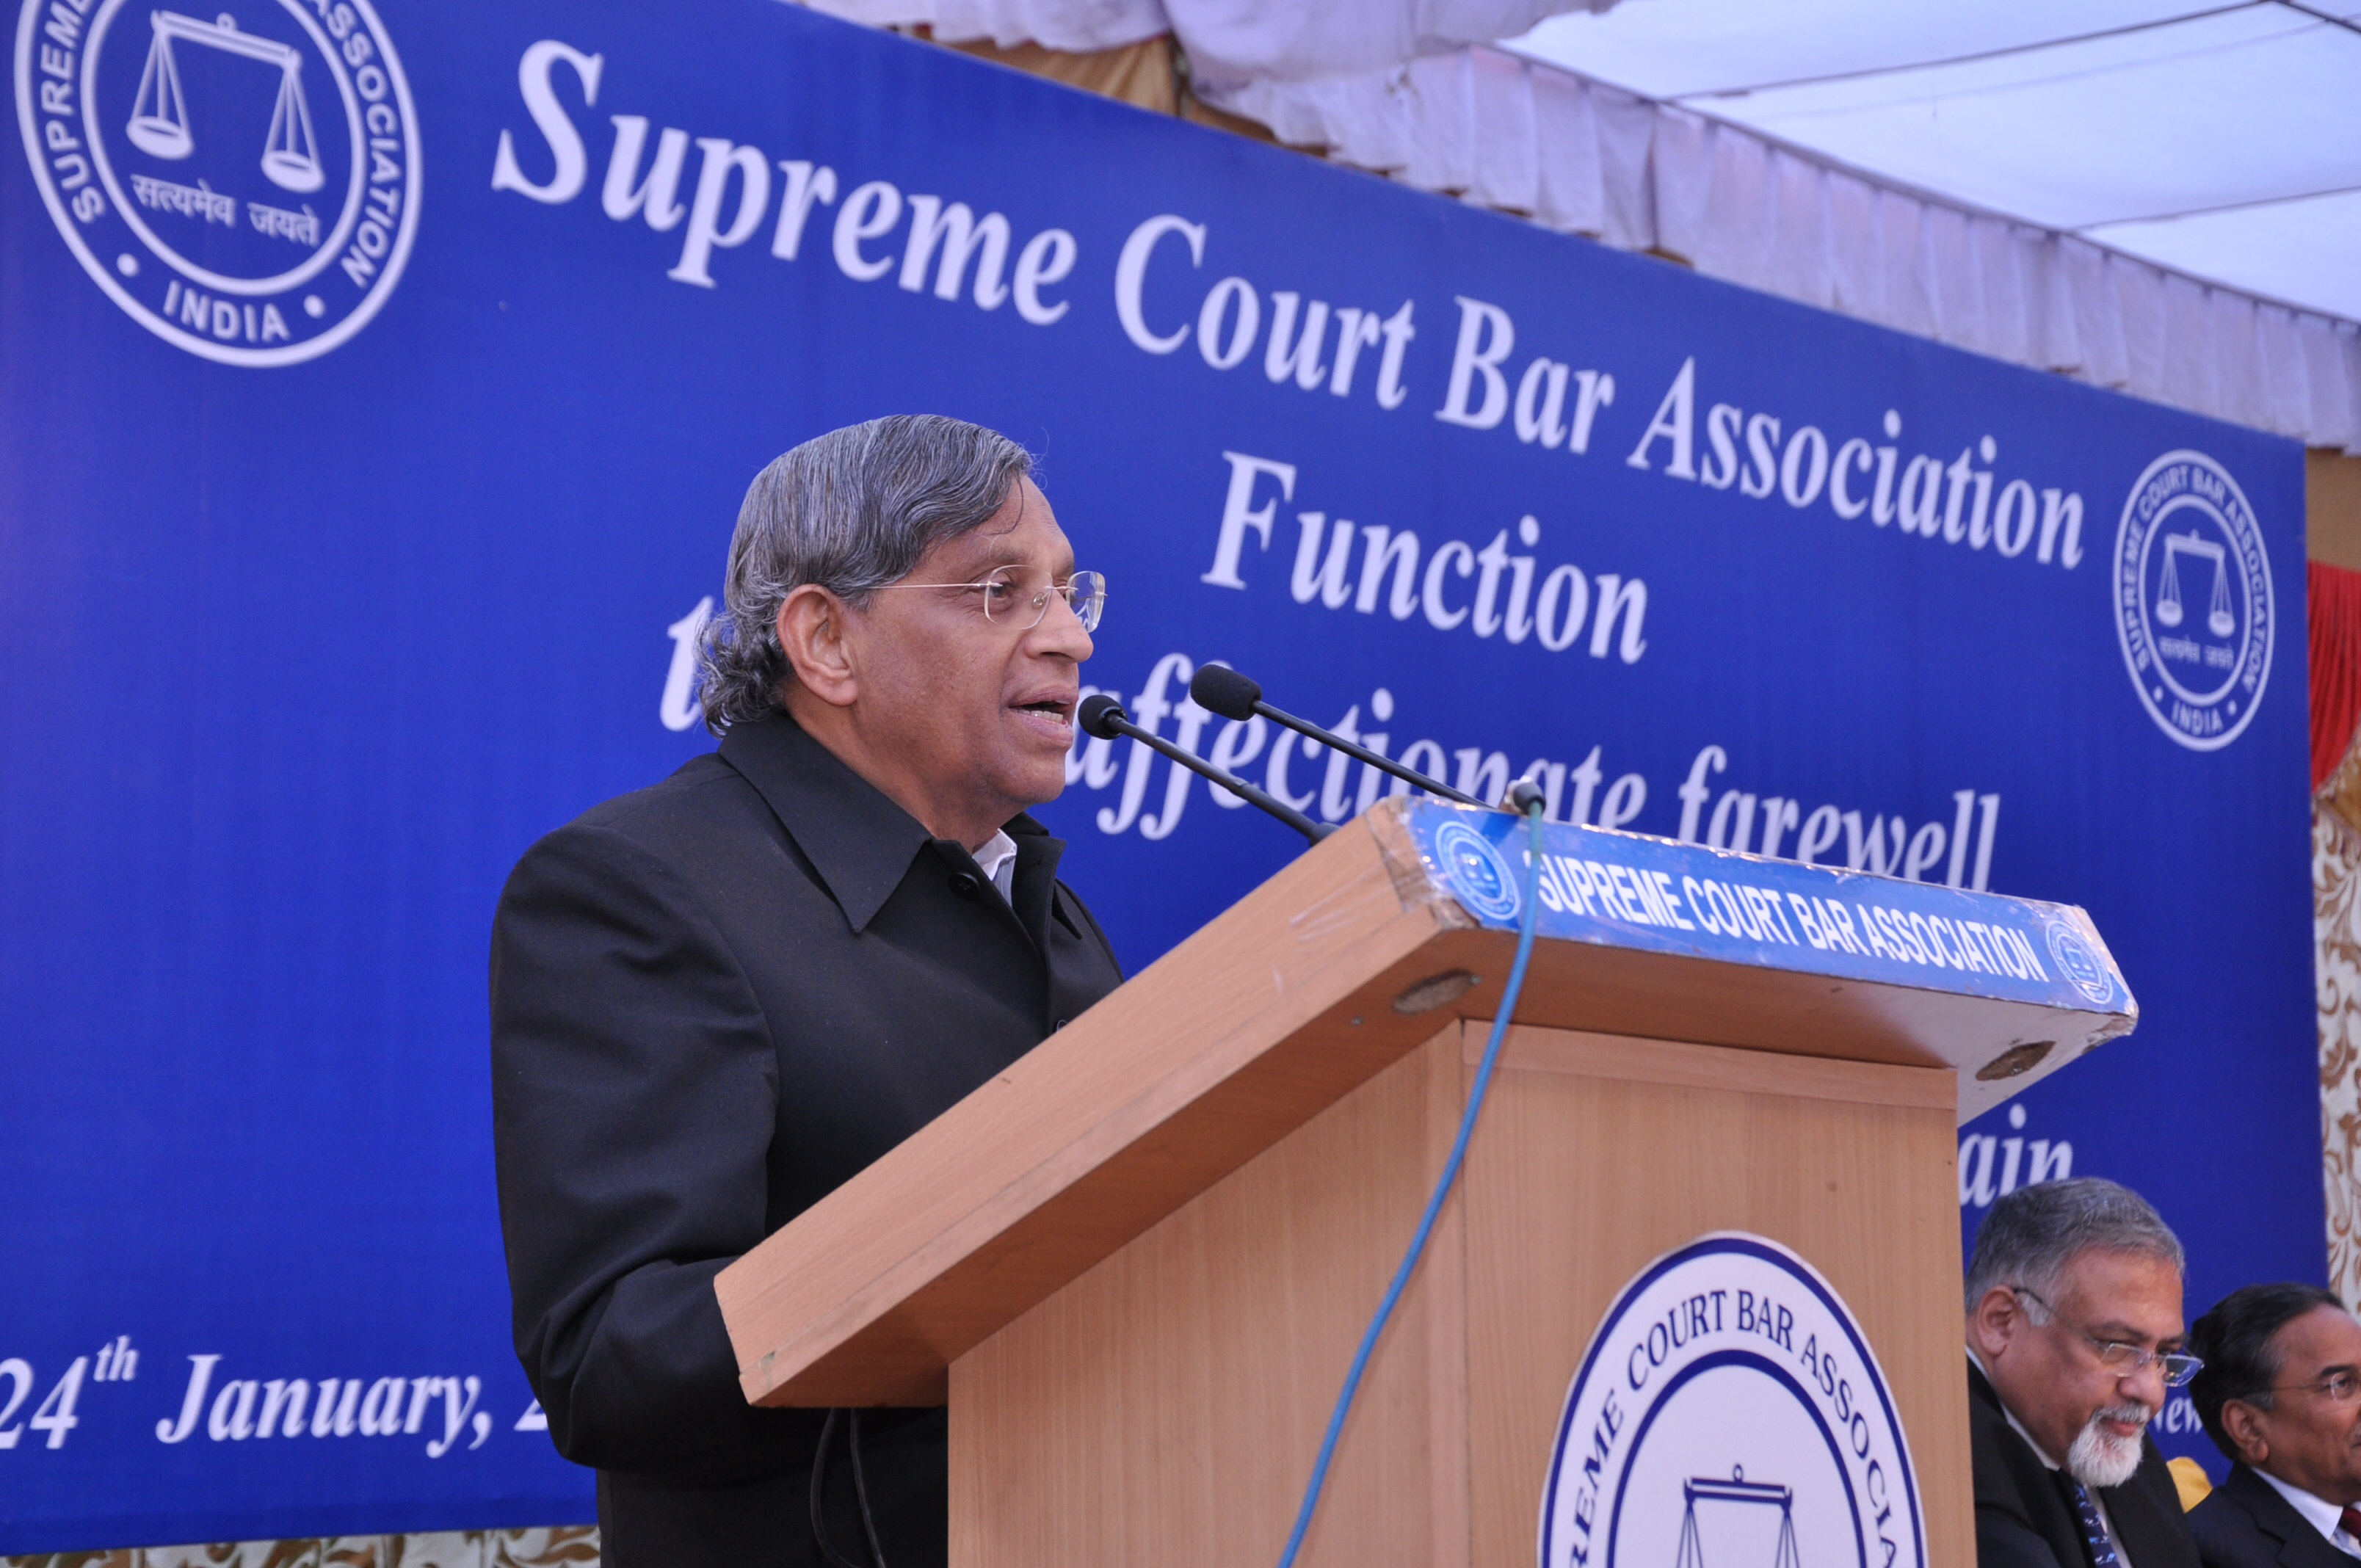 M. N. Krishnamani